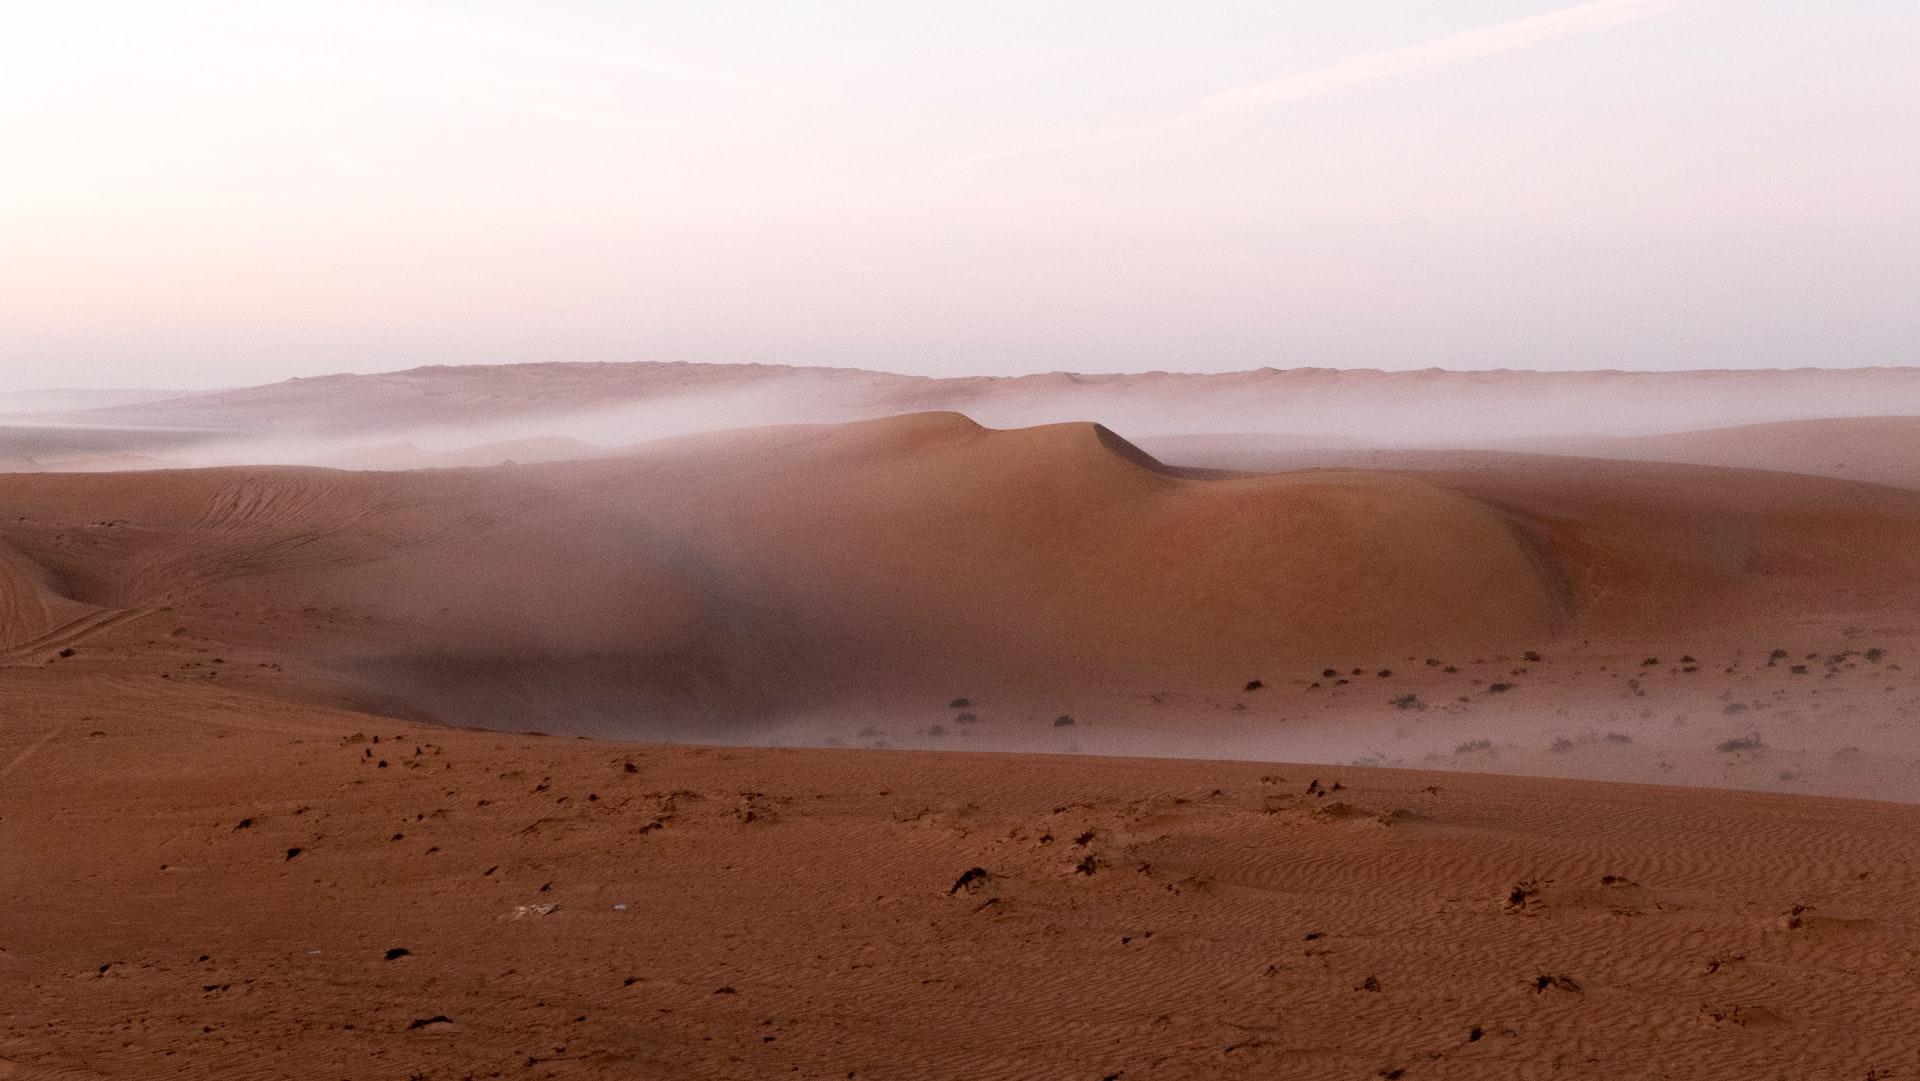 Foggy morning in the desert in Oman